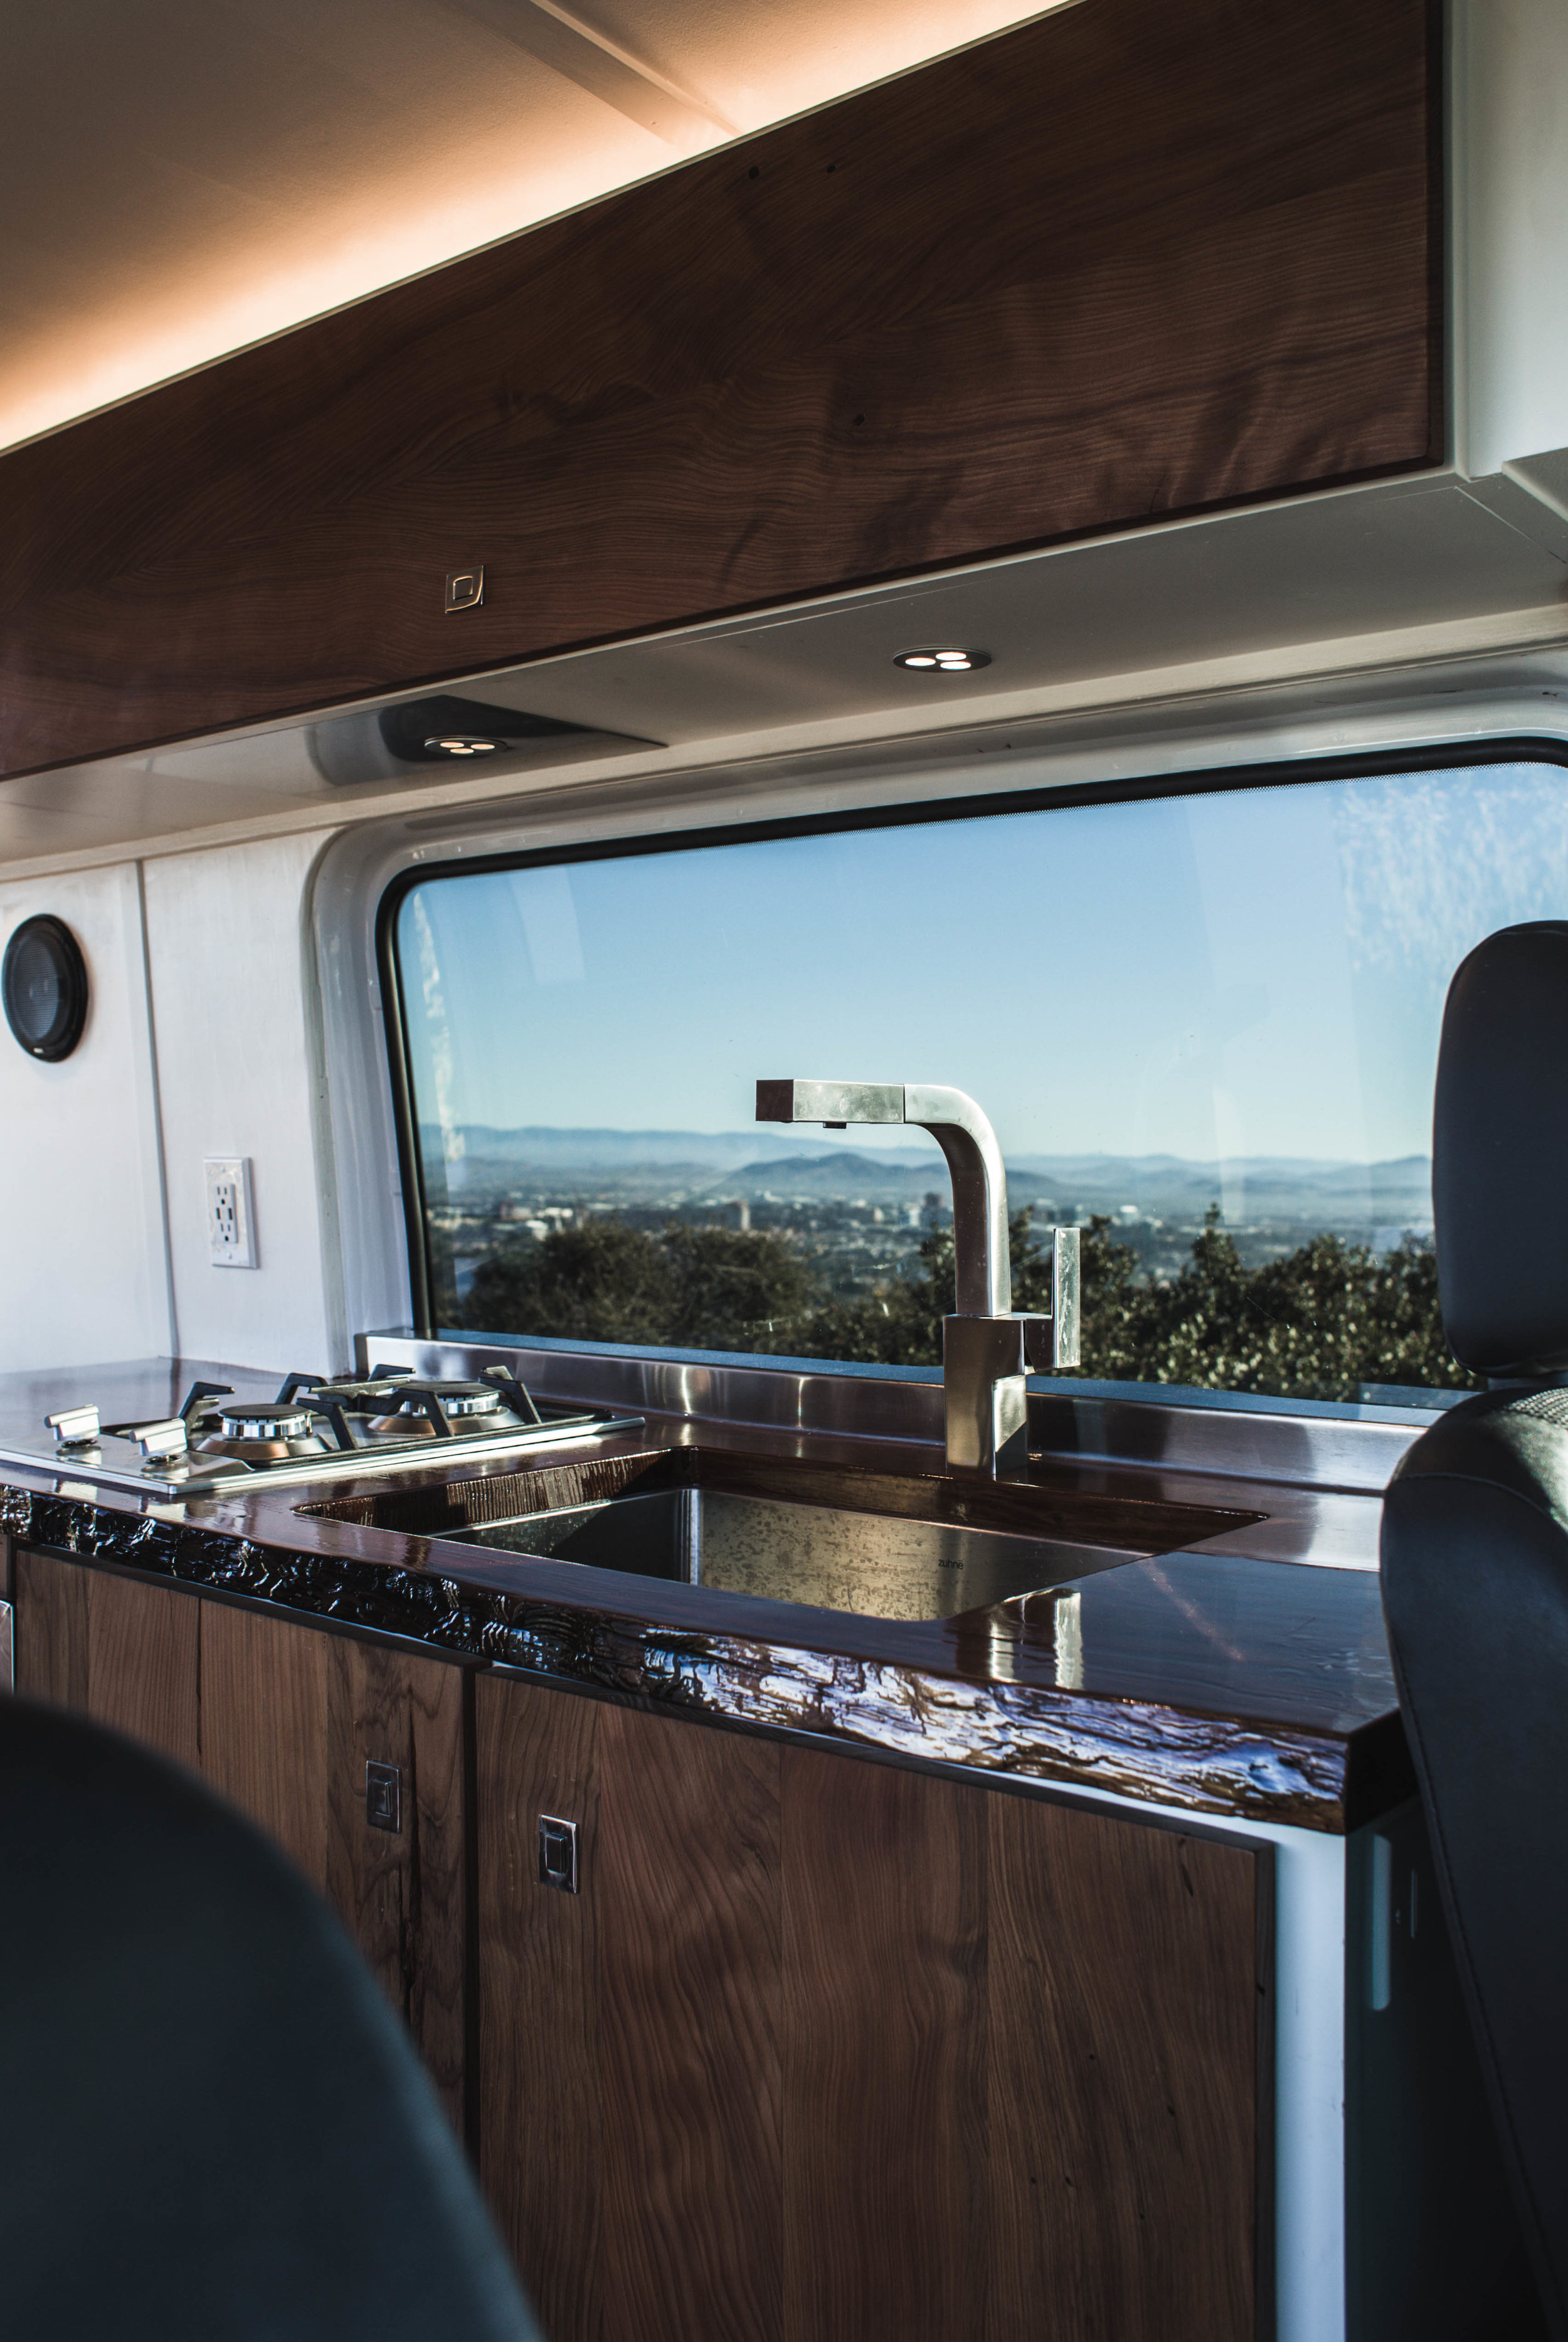 kitchen. Mercedes-Benz B class campervan MB 140 2015